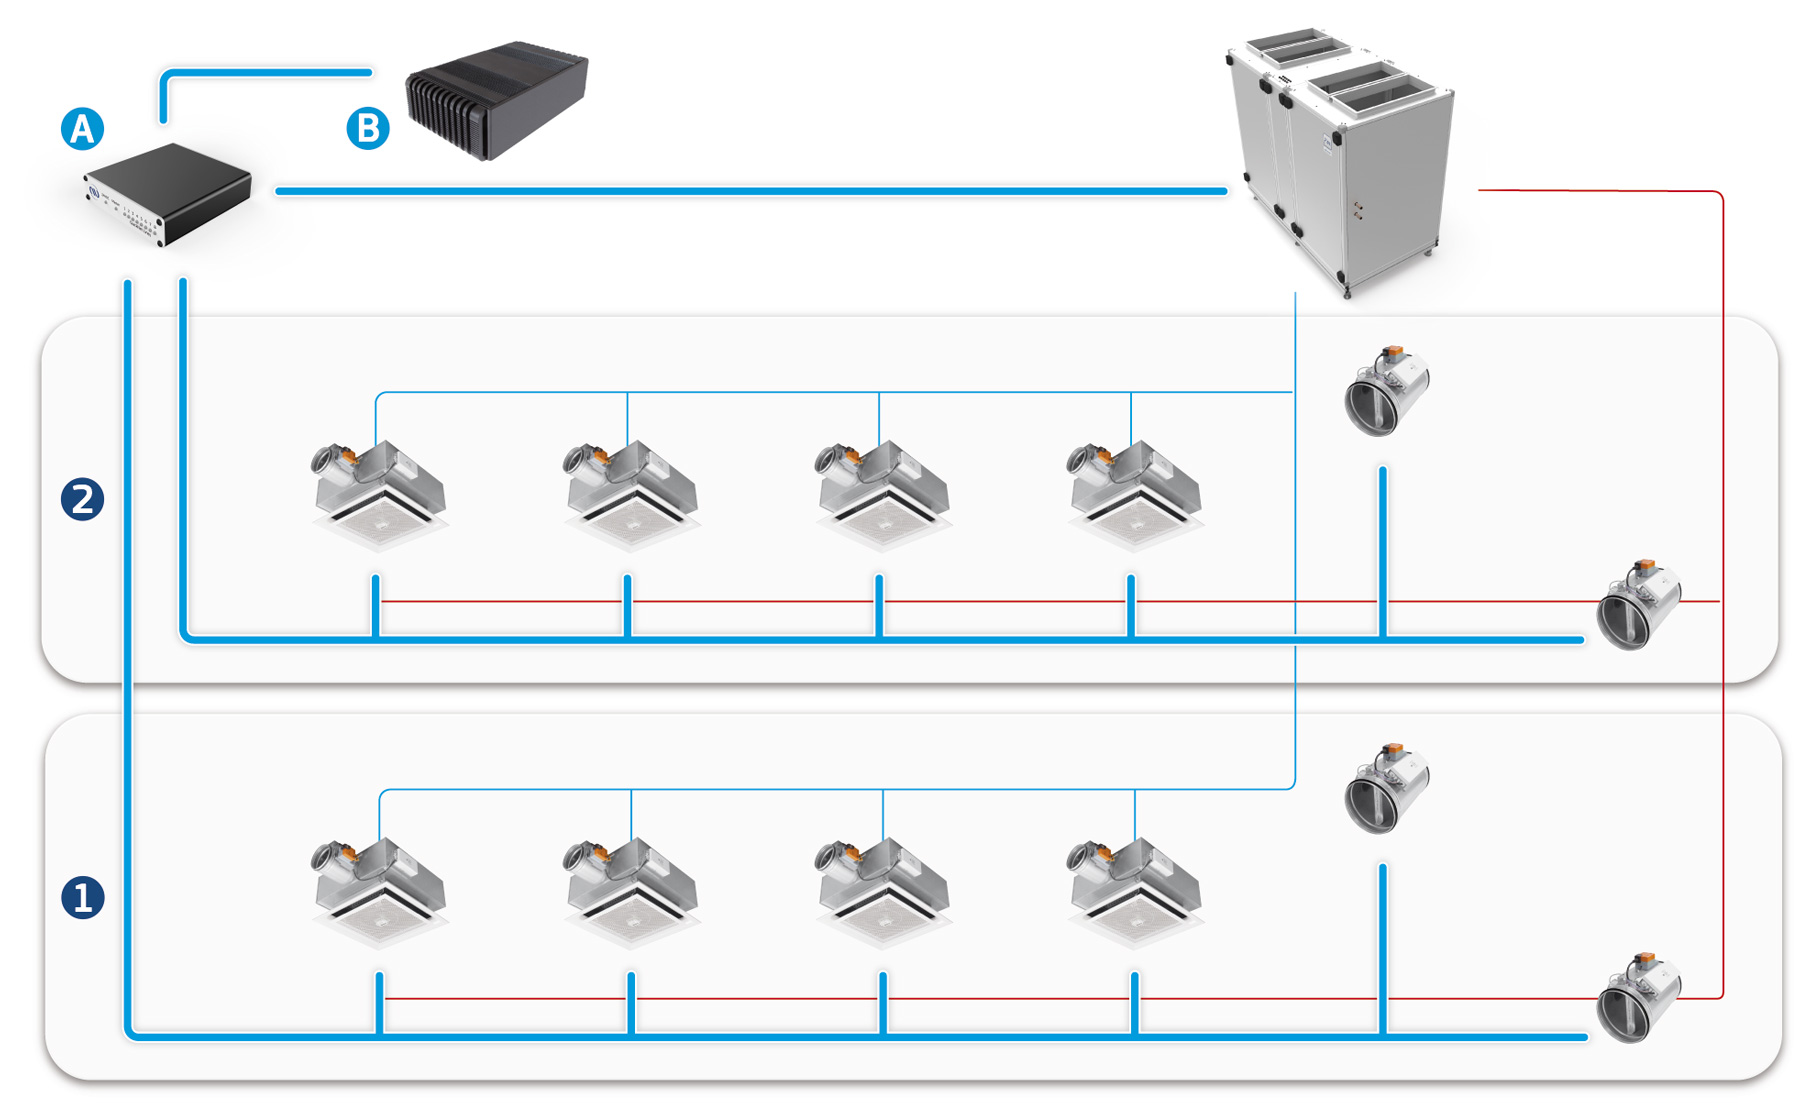 Quicknet rendszerábra